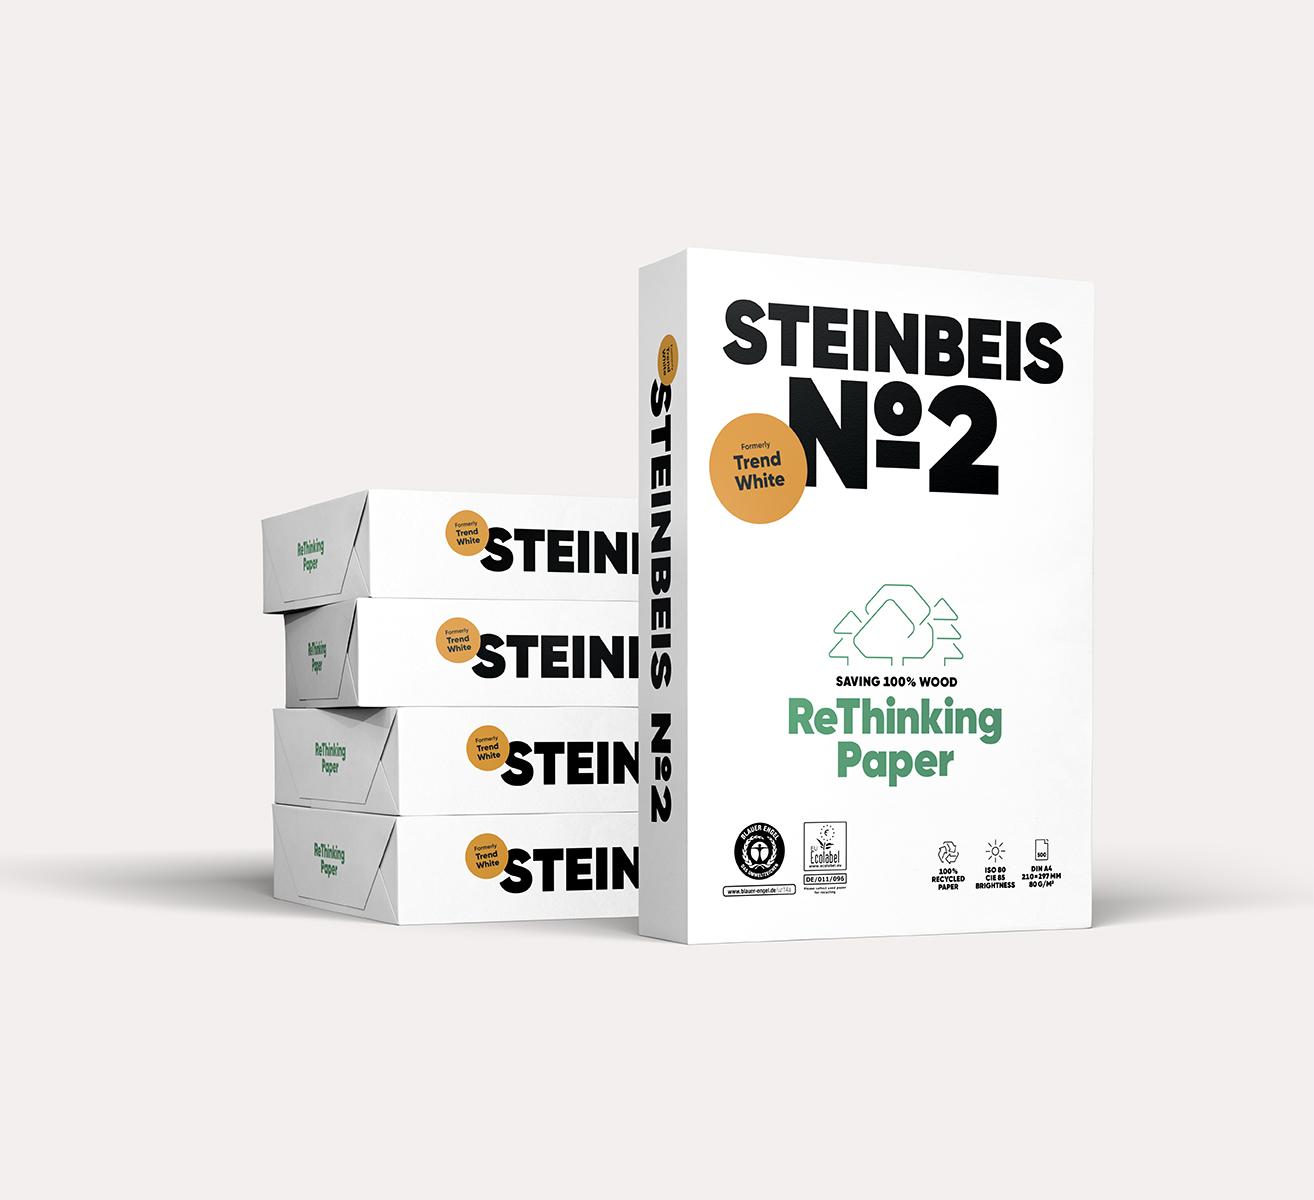 Steinbeis №2